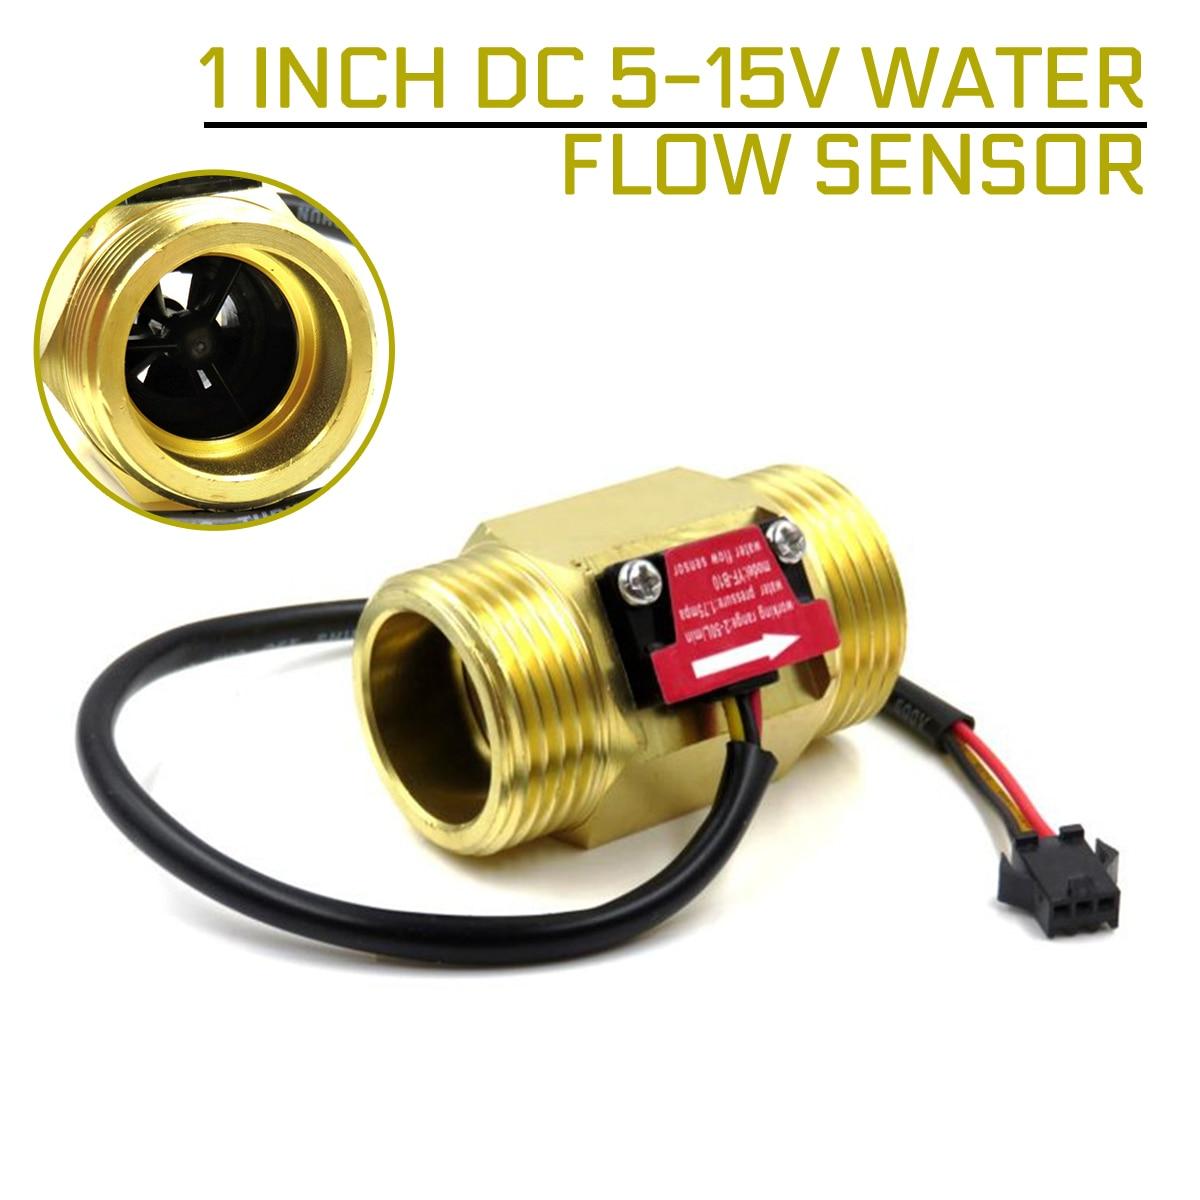 1 Inch DC 5-15V Water Flow Sensor Hall Sensor Switch Flow Meter Water Flow Sensor DN25 Brass Water Meter Industrial Flowmeter